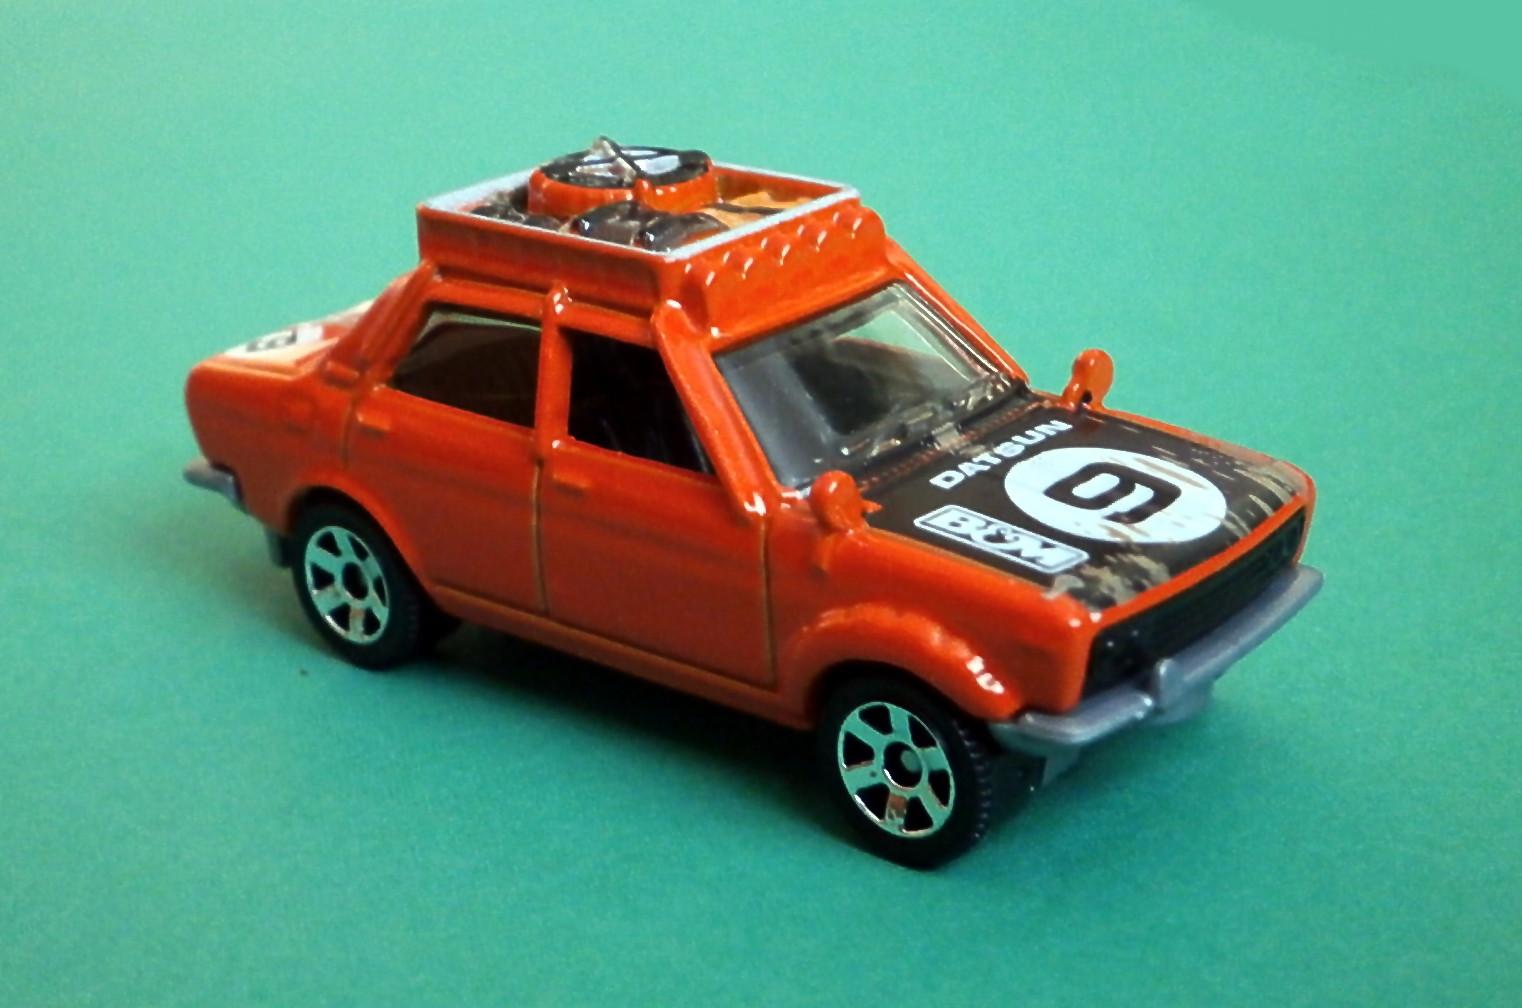 ´70 Datsun 510 | Matchbox Cars Wiki | FANDOM powered by Wikia